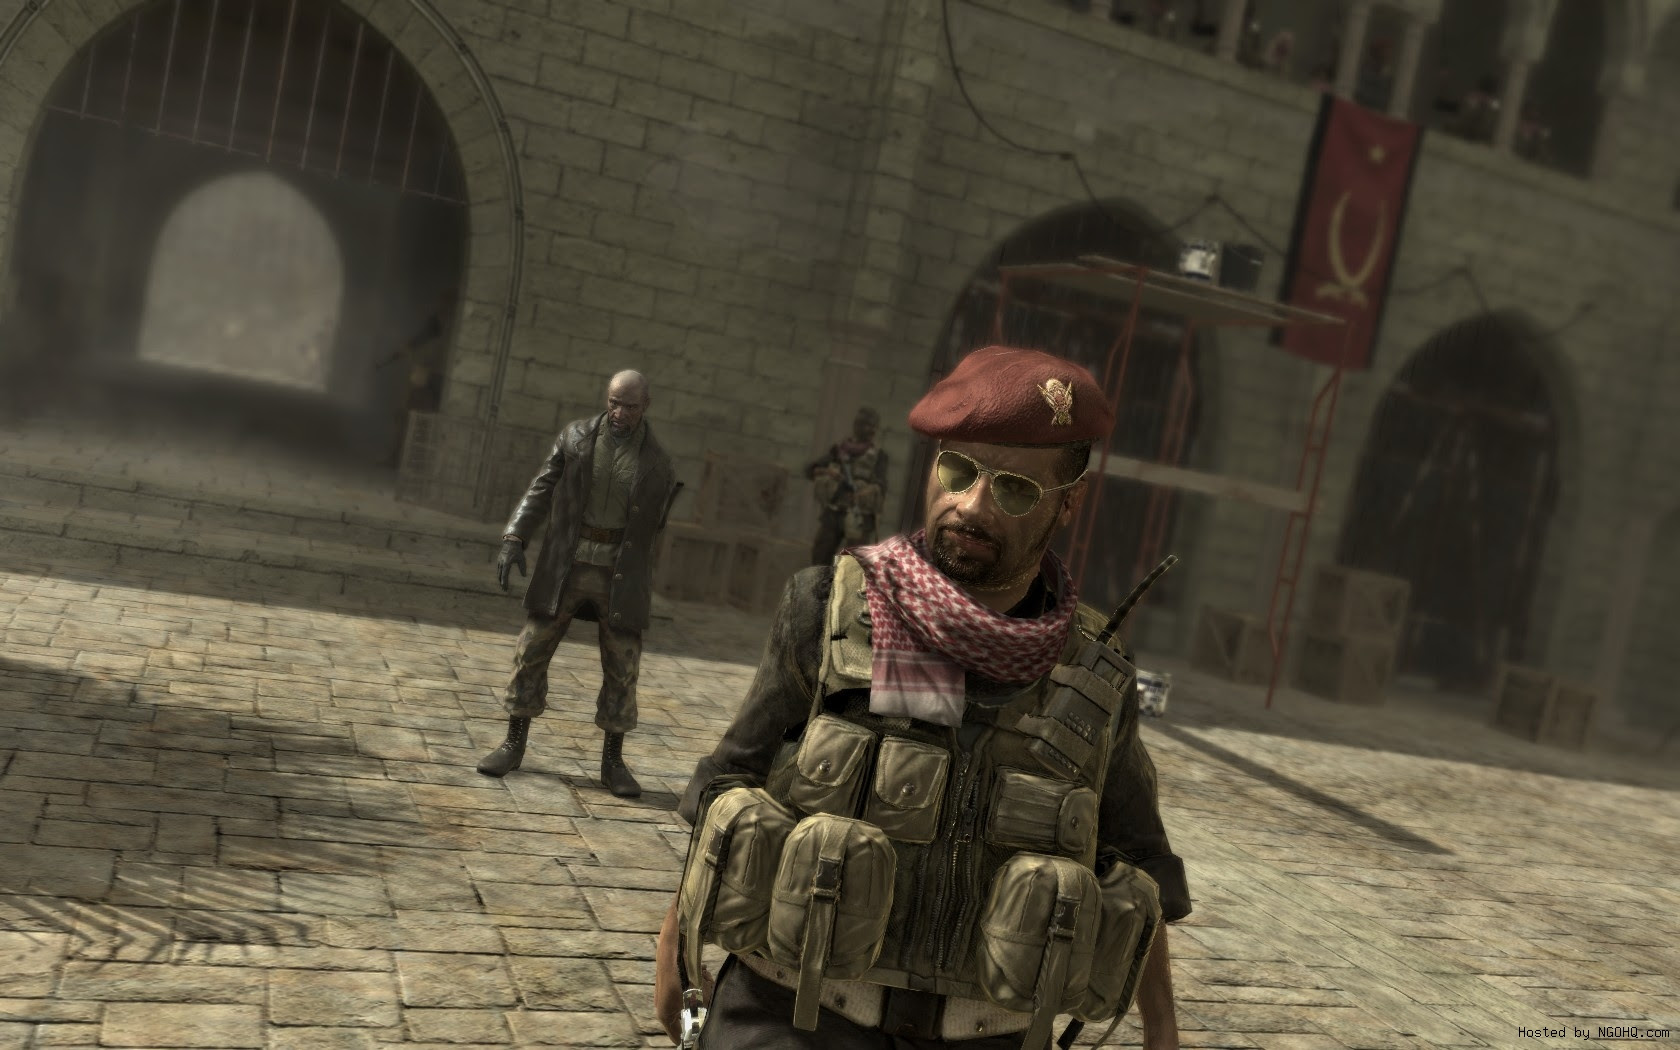 Call Of Duty 4 Modern Warfare Wallpaper 1680x1050 67328